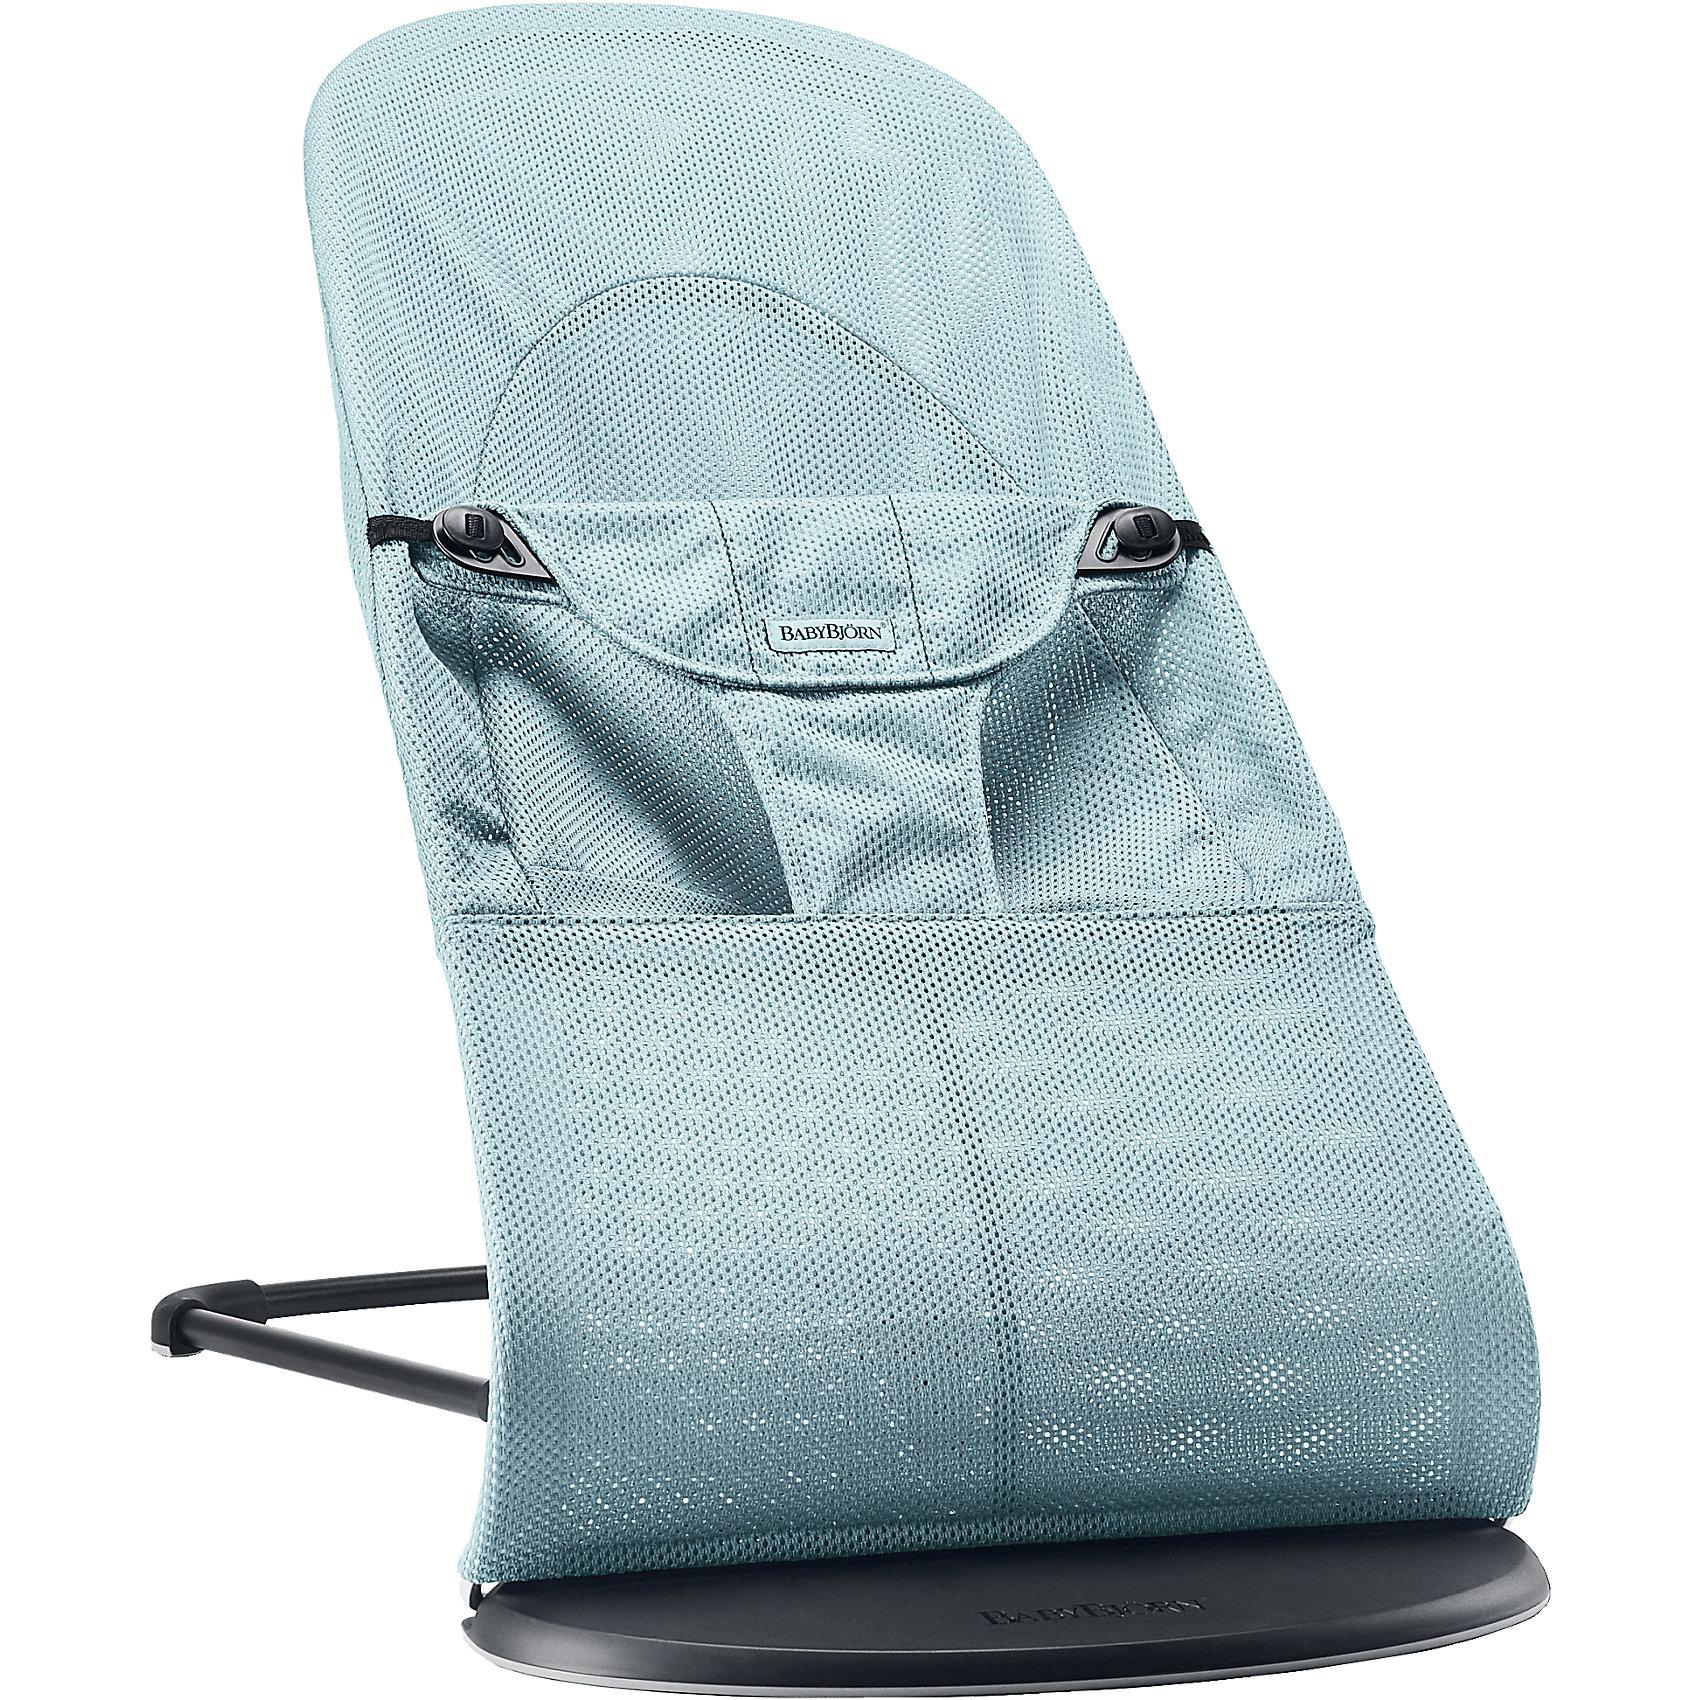 BabyBjorn Кресло-шезлонг Balance Soft Air, BabyBjorn, бирюзовый кресла качалки шезлонги babybjorn кресло шезлонг bliss mesh